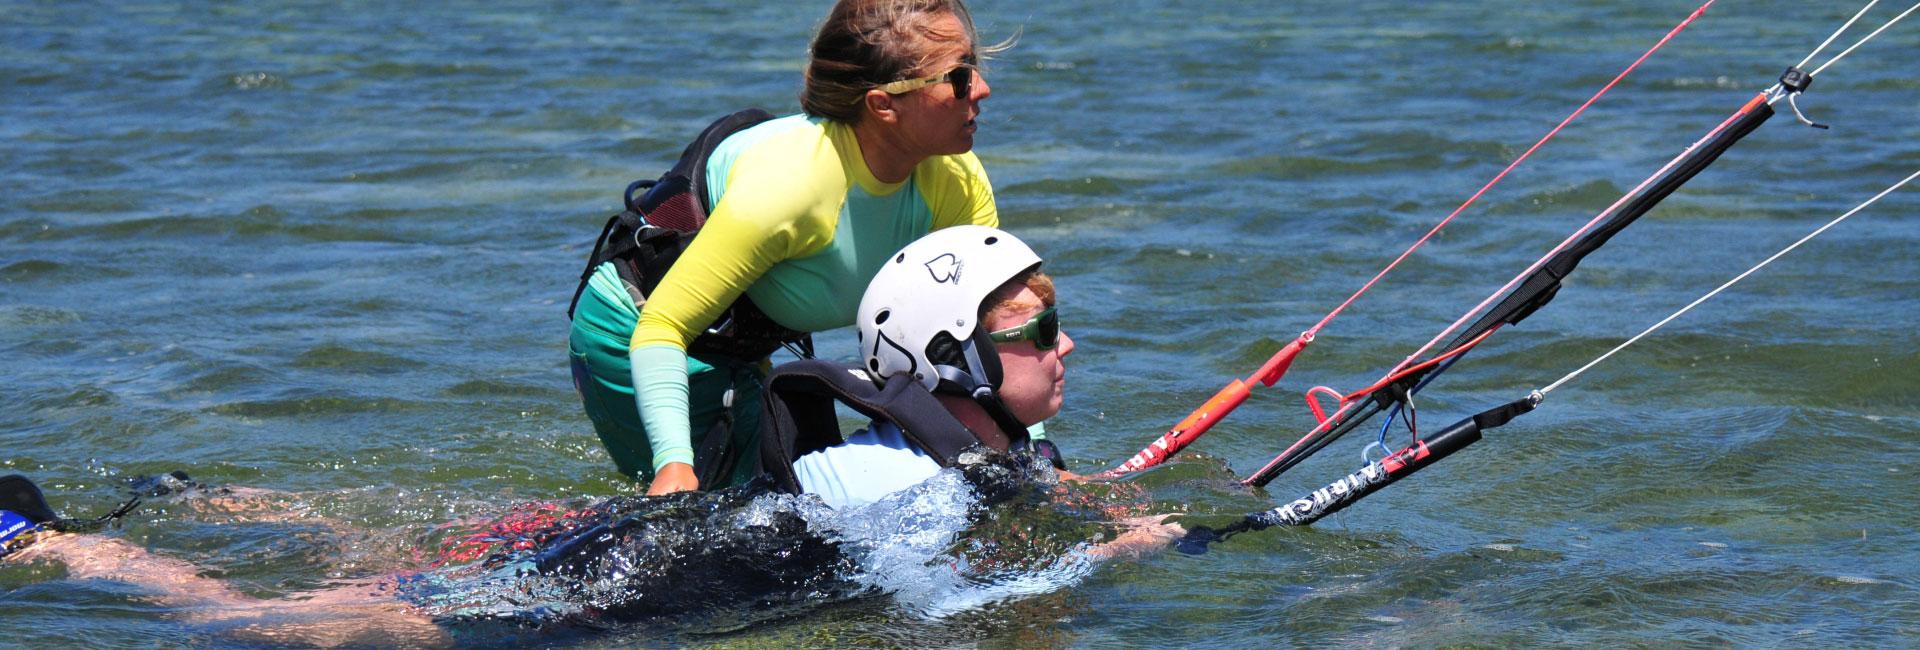 bodydrag-kitesurfing-mauritius